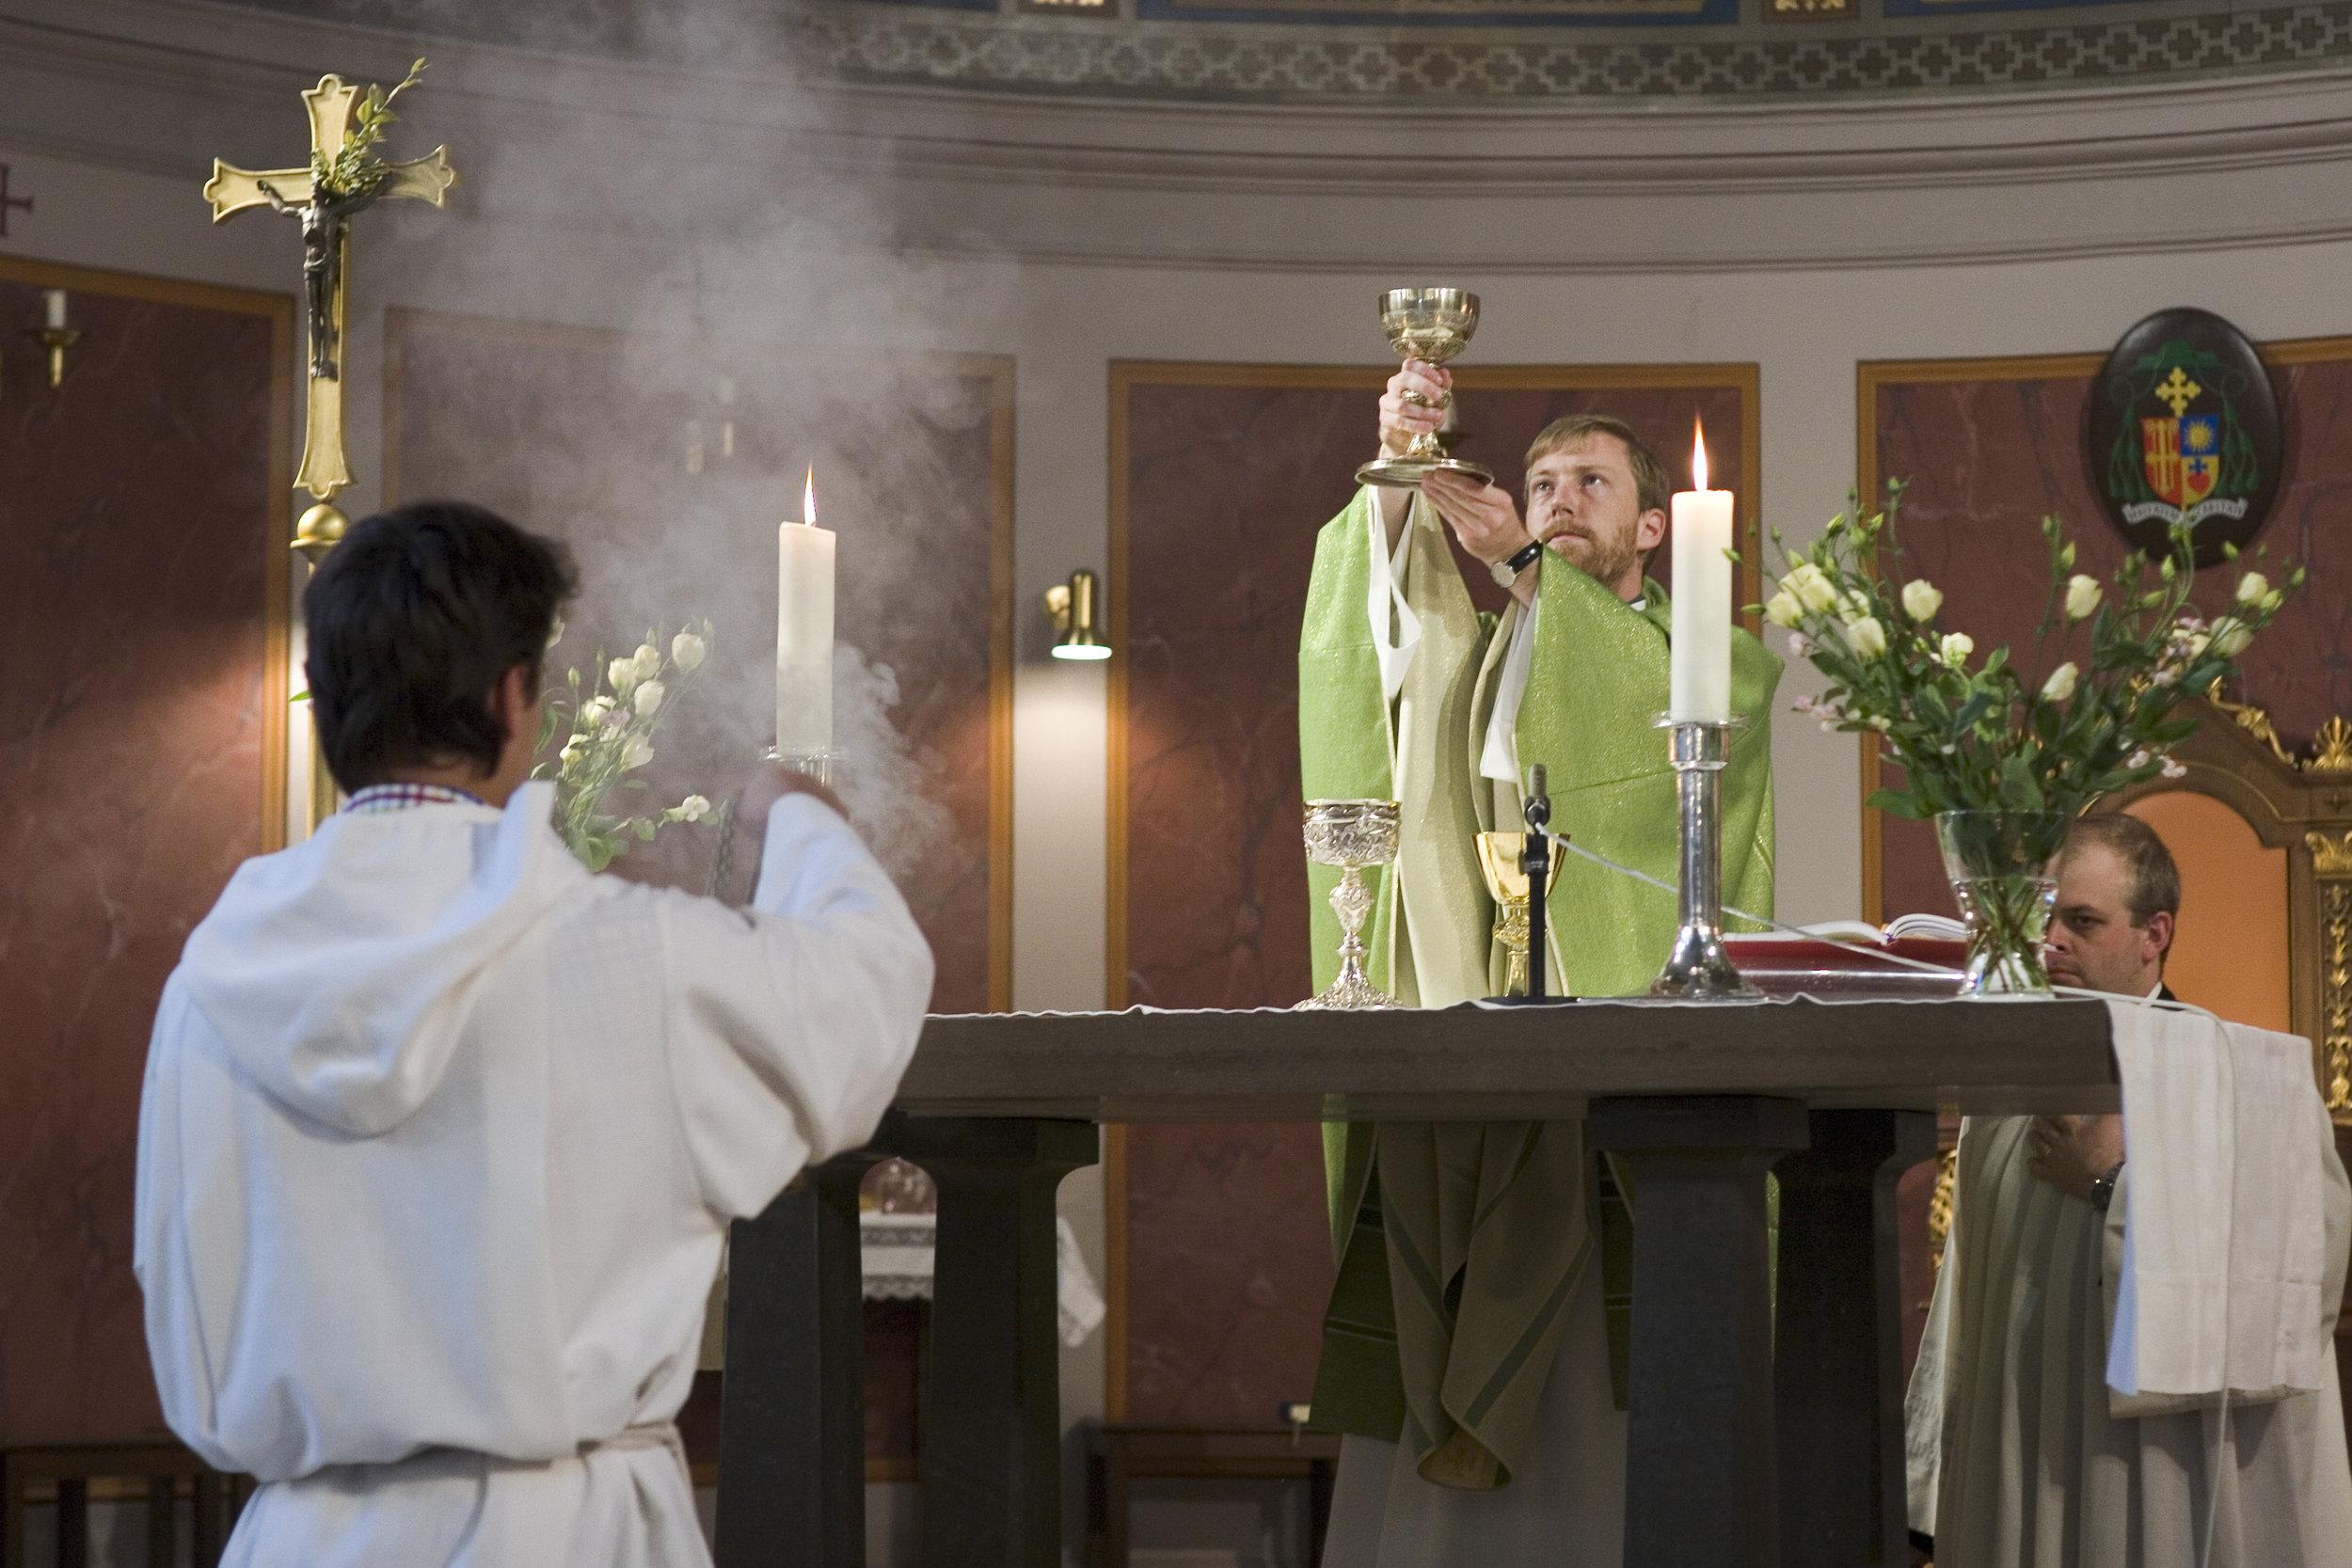 Father Daniel Nørgaard lifts the communion cup during mass at Sankt Ansgar in Copenhagen, Denmark